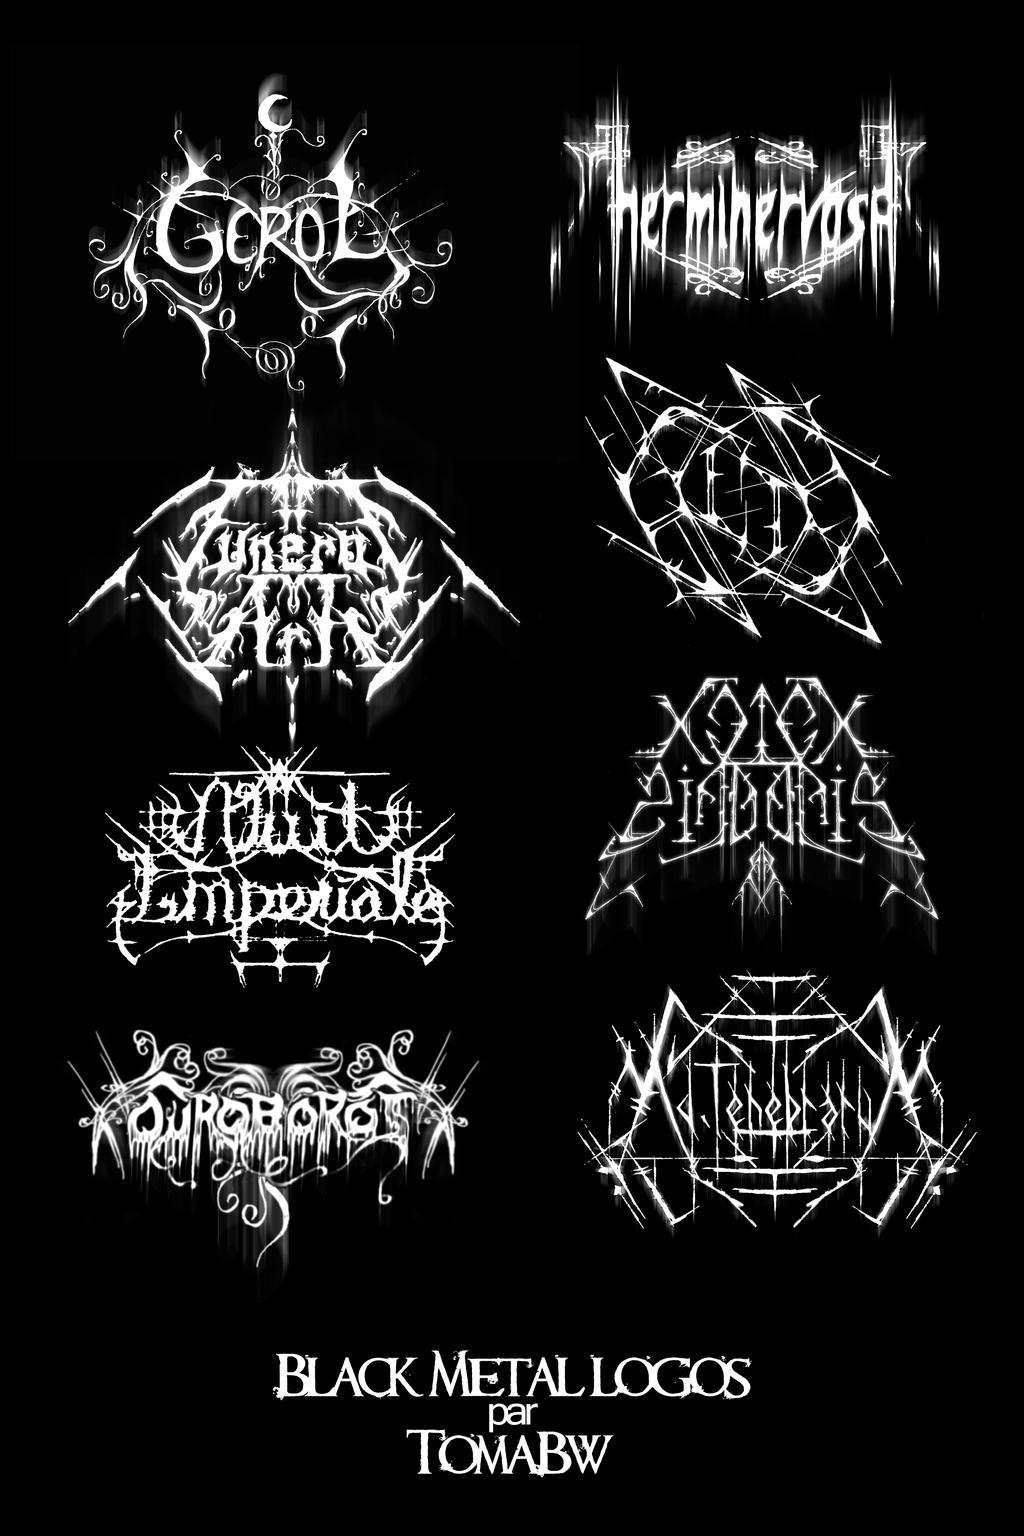 Black metal typo by tomabw on deviantart